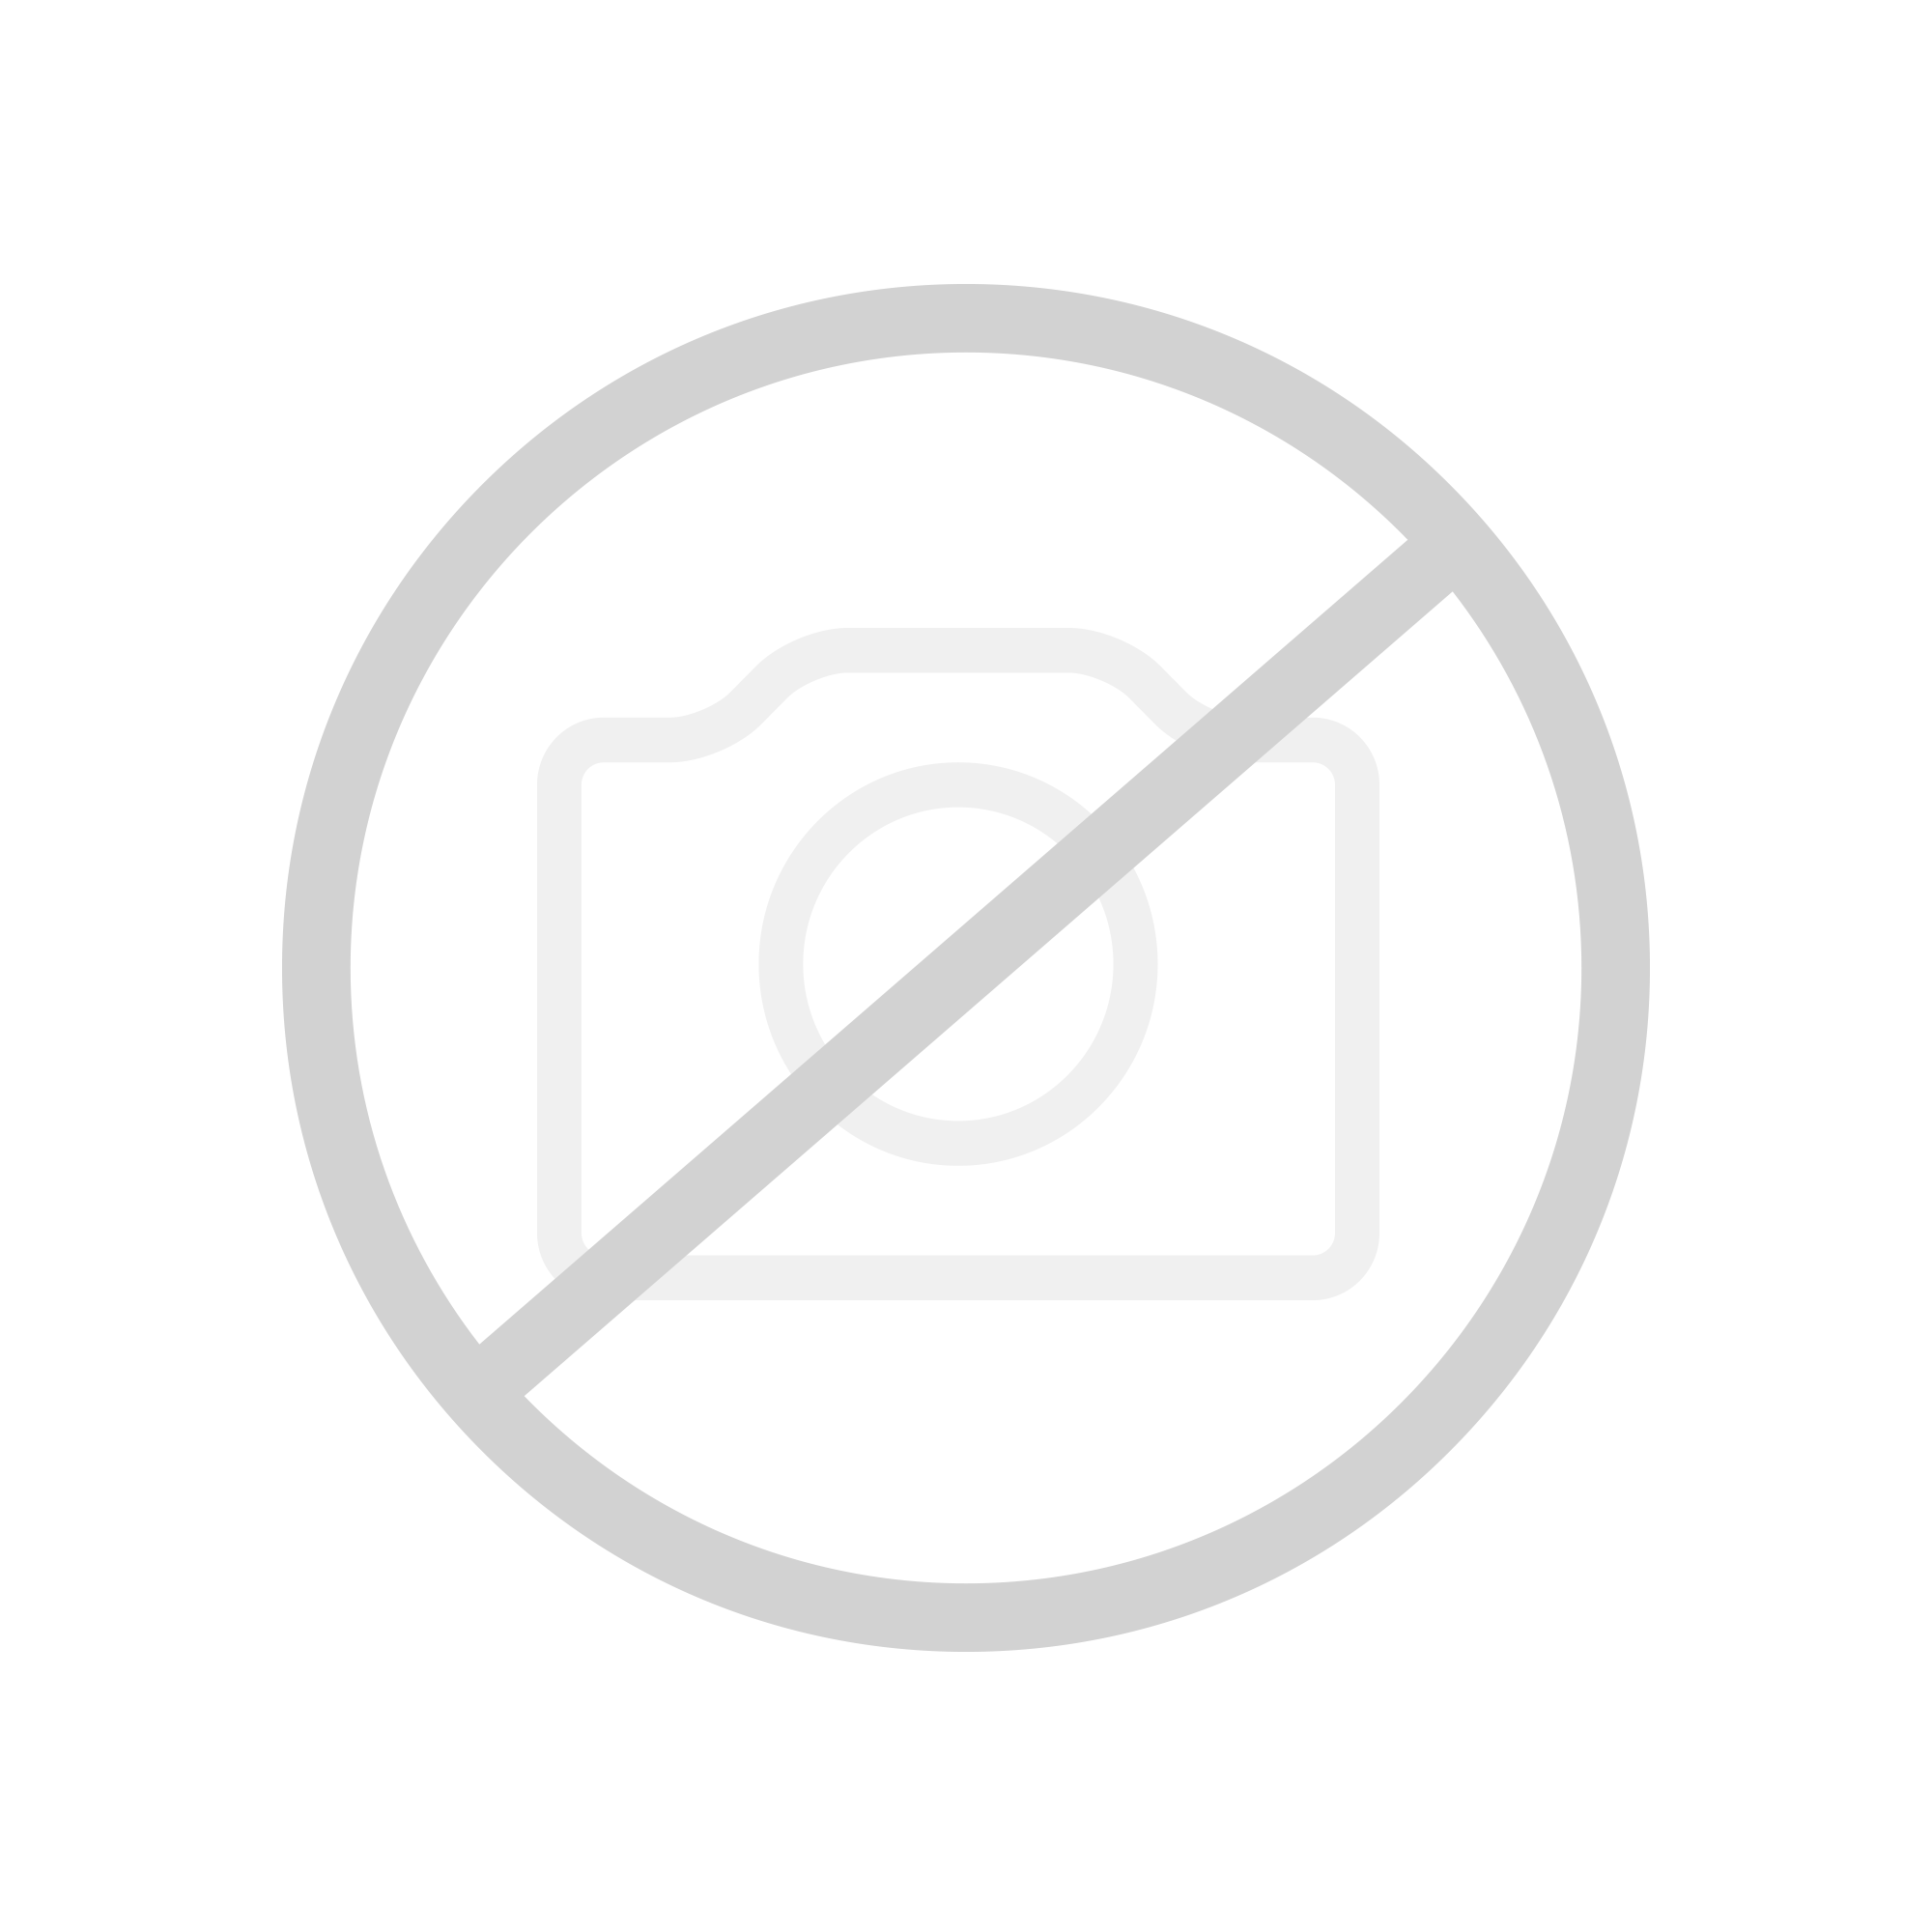 Badgestaltung - Ideen Und Inspirationen Bei Reuter Badgestaltung Fliesen Holzoptik